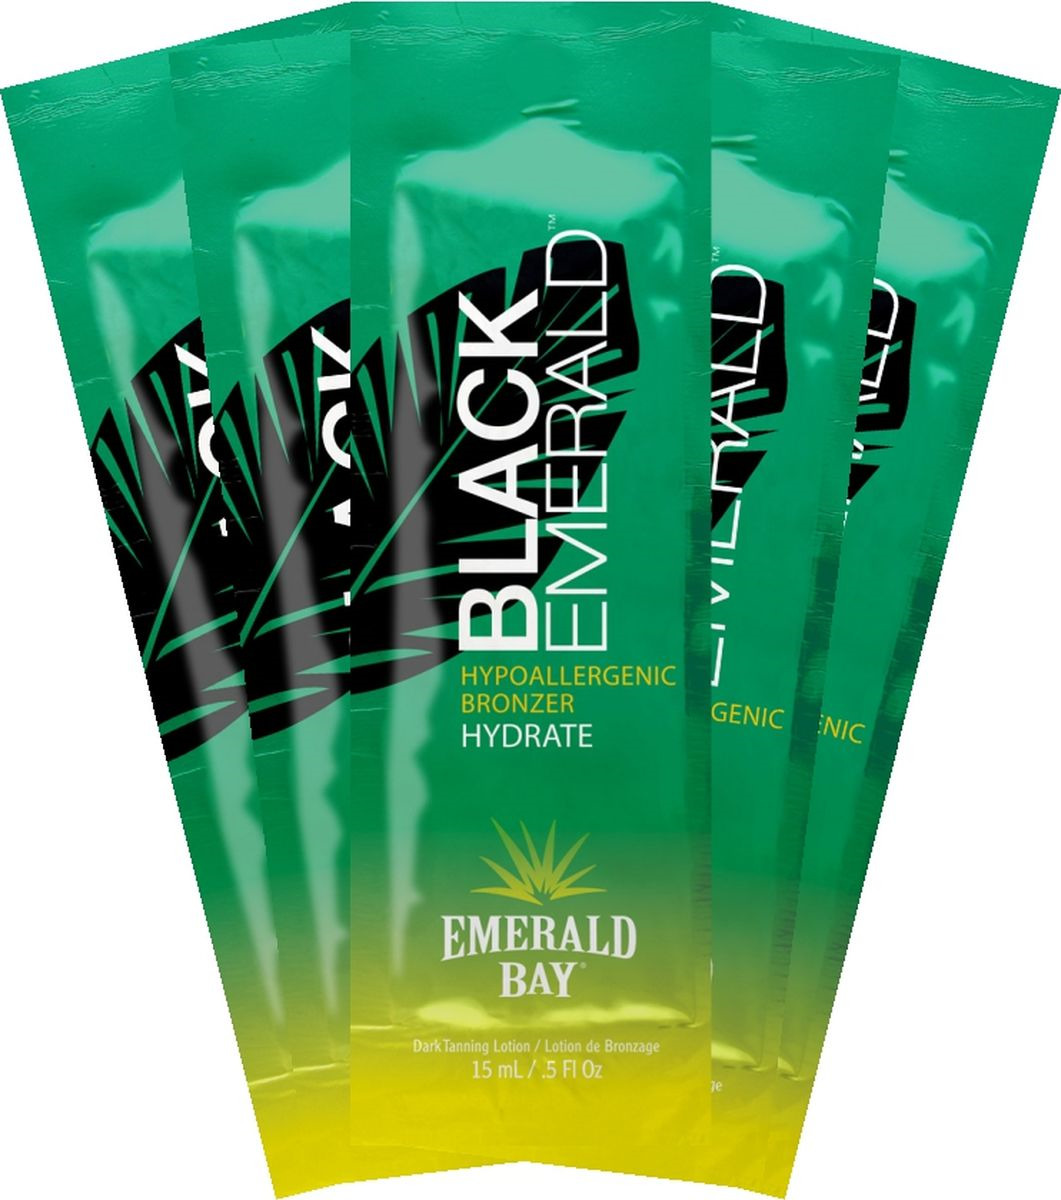 Крем для загара в солярии Emerald Bay OEB1022 california tan крем для загара в солярии biofusion optimizer step 2 189 мл